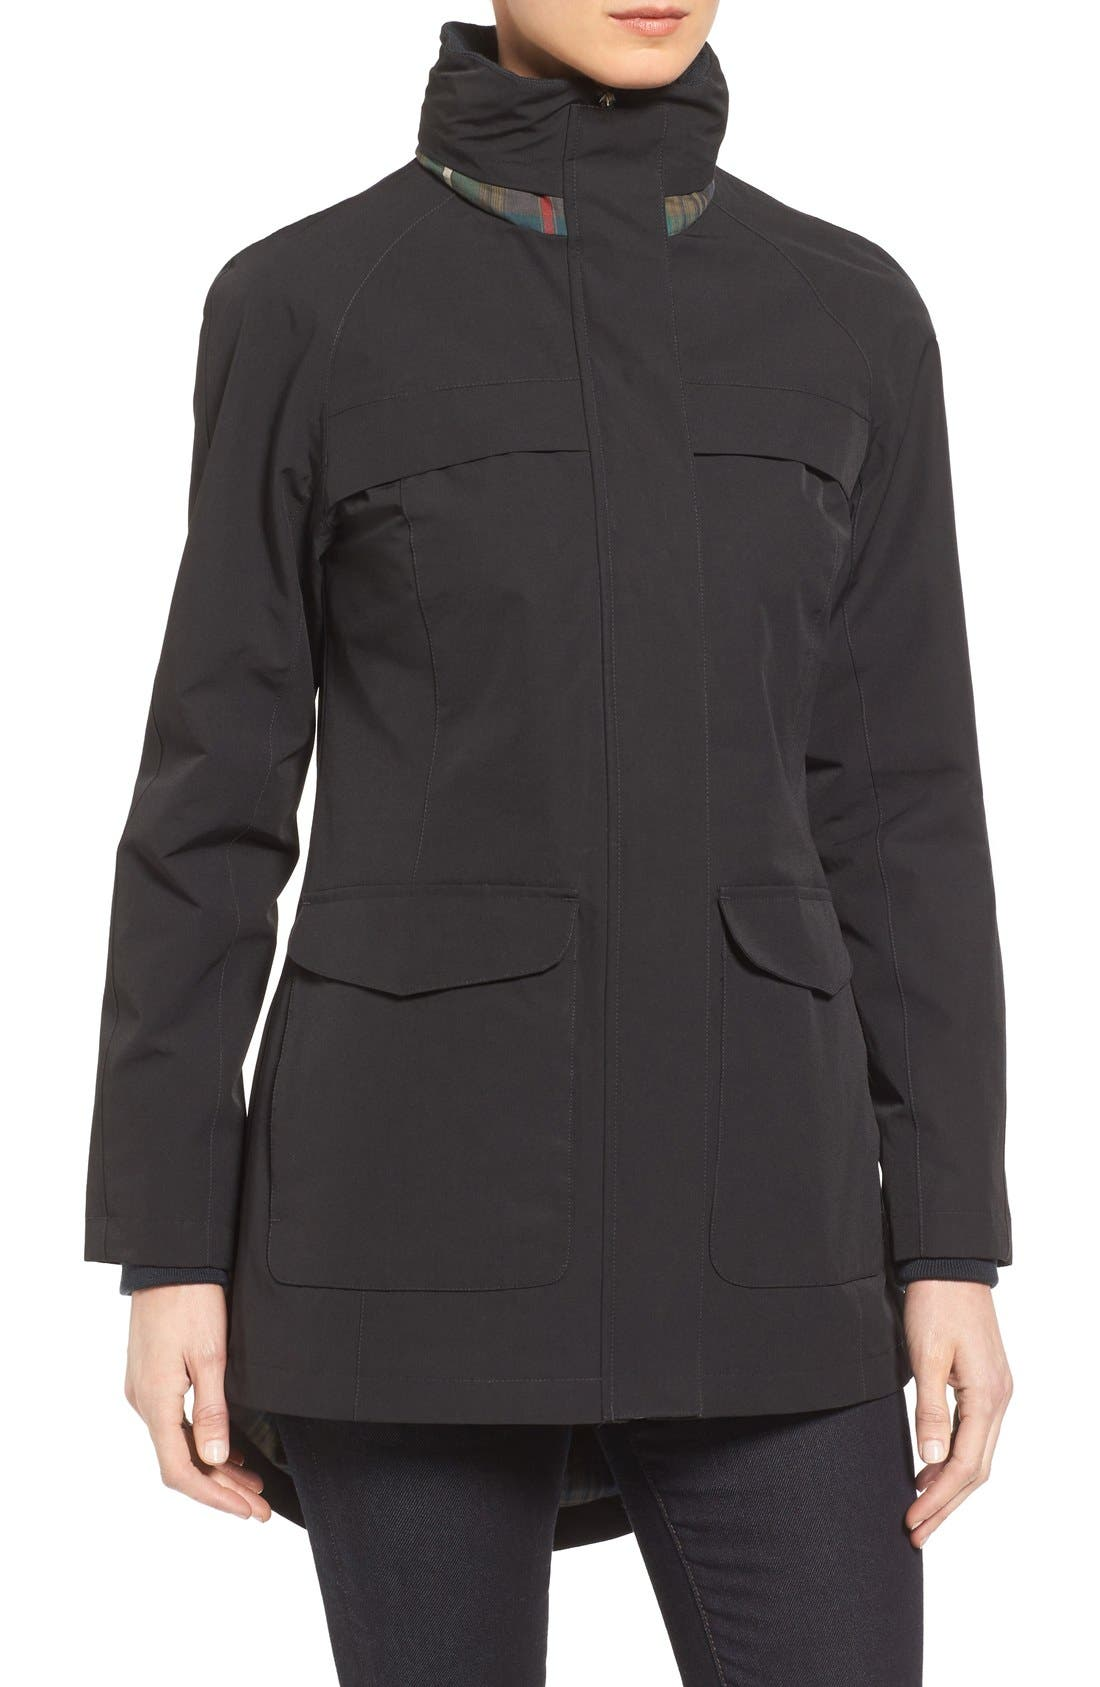 Hooded Raincoat,                             Alternate thumbnail 4, color,                             Black